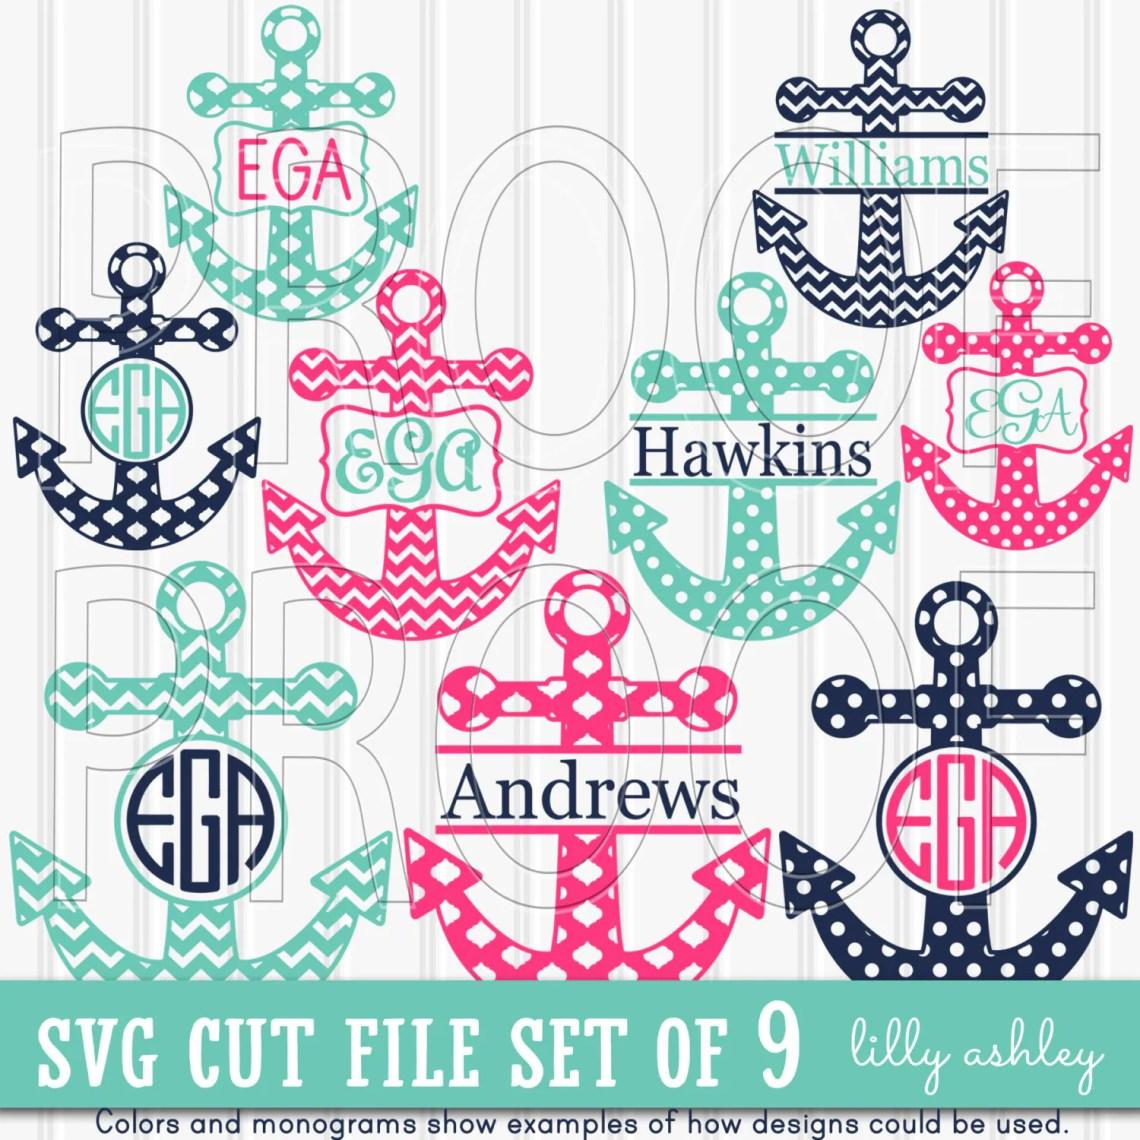 Download Monogram SVG Files Set includes 9 cutting files SVG/JPG